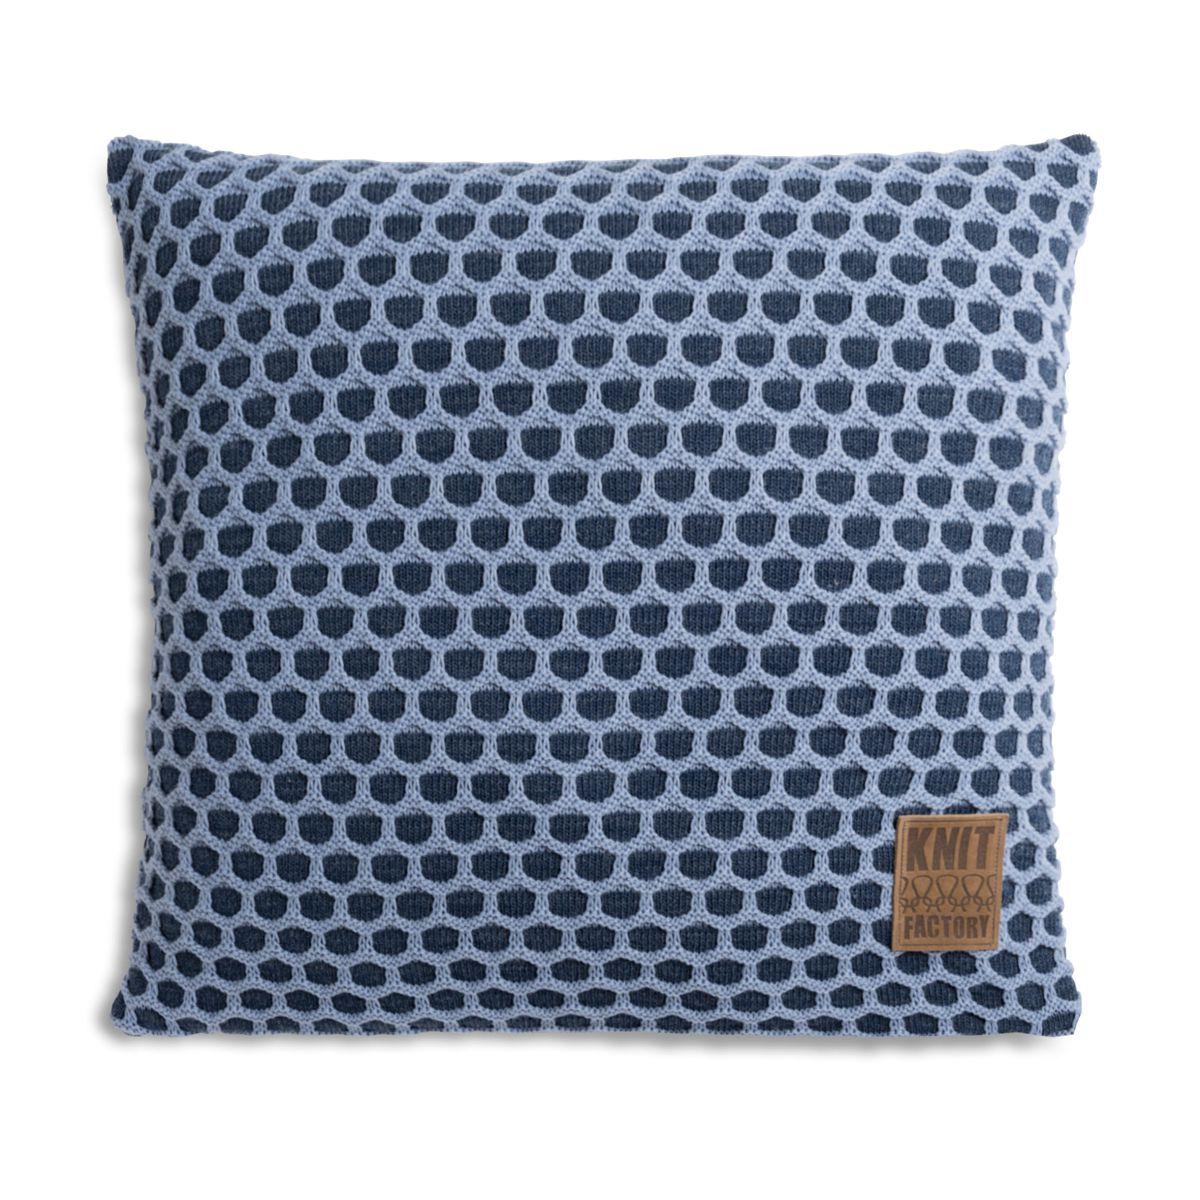 knit factory 1081254 kussen 50x50 mila jeans indigo 1